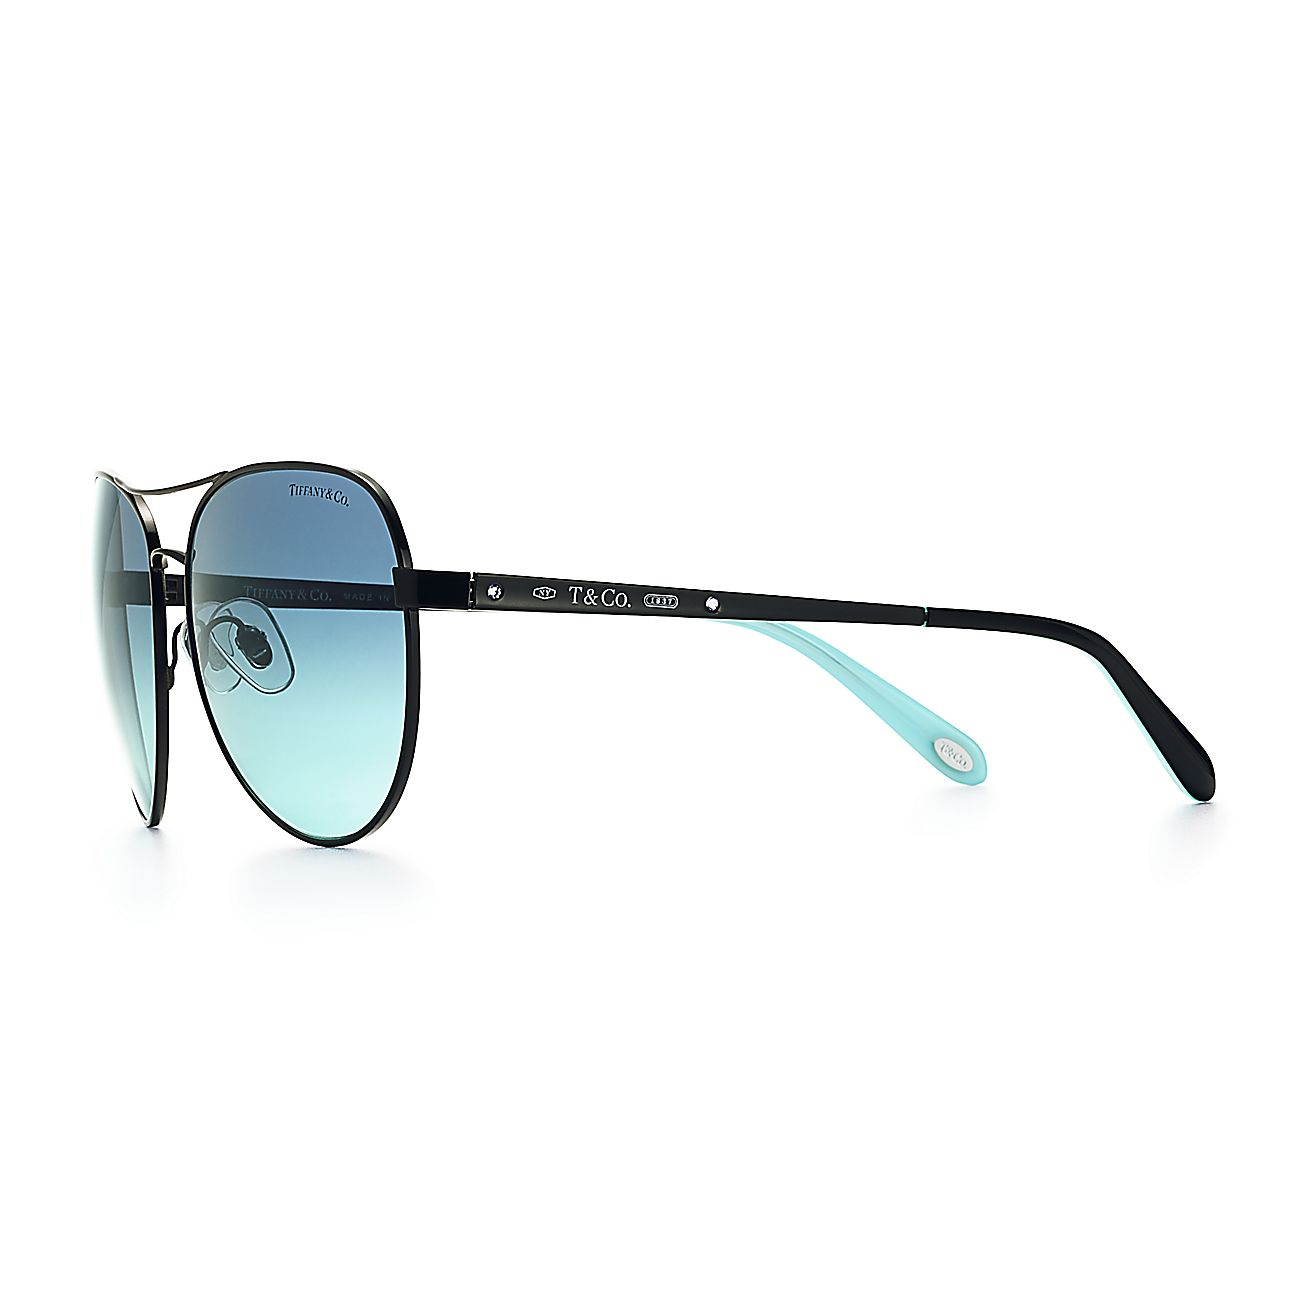 f4697f4265f2 Tiffany And Co Aviator Sunglasses